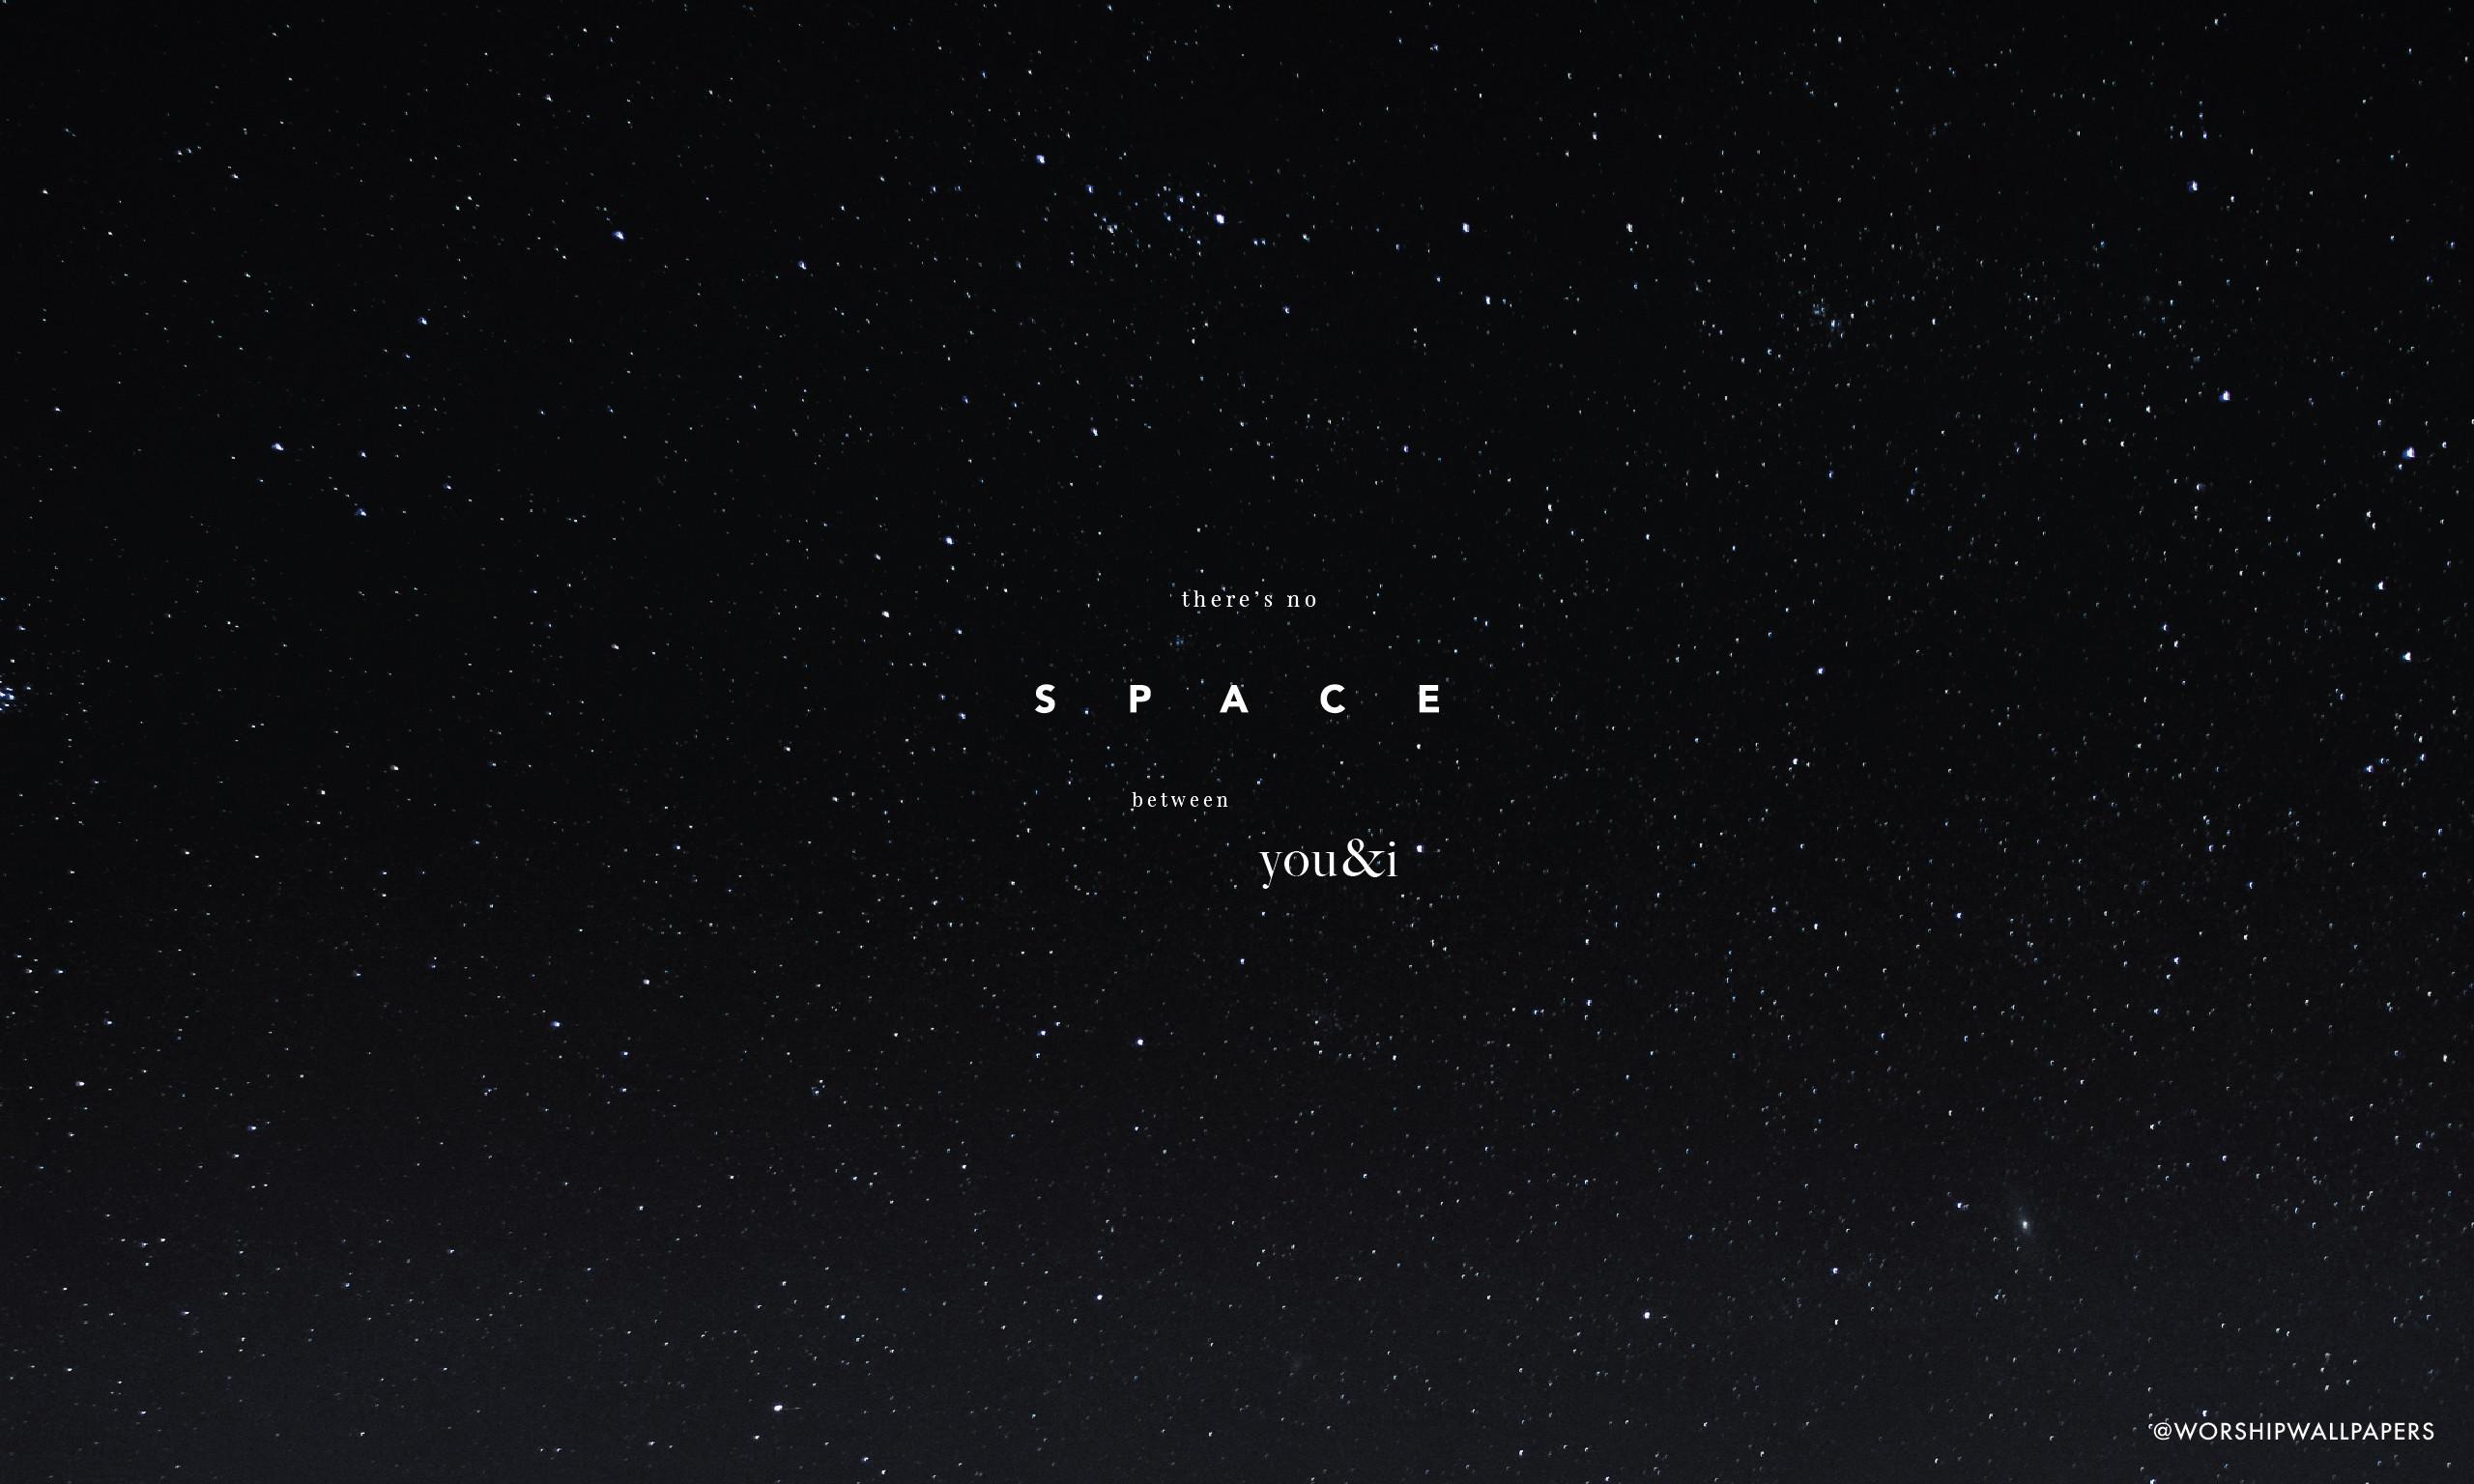 Starlight // Bethel Music & Amanda Cook